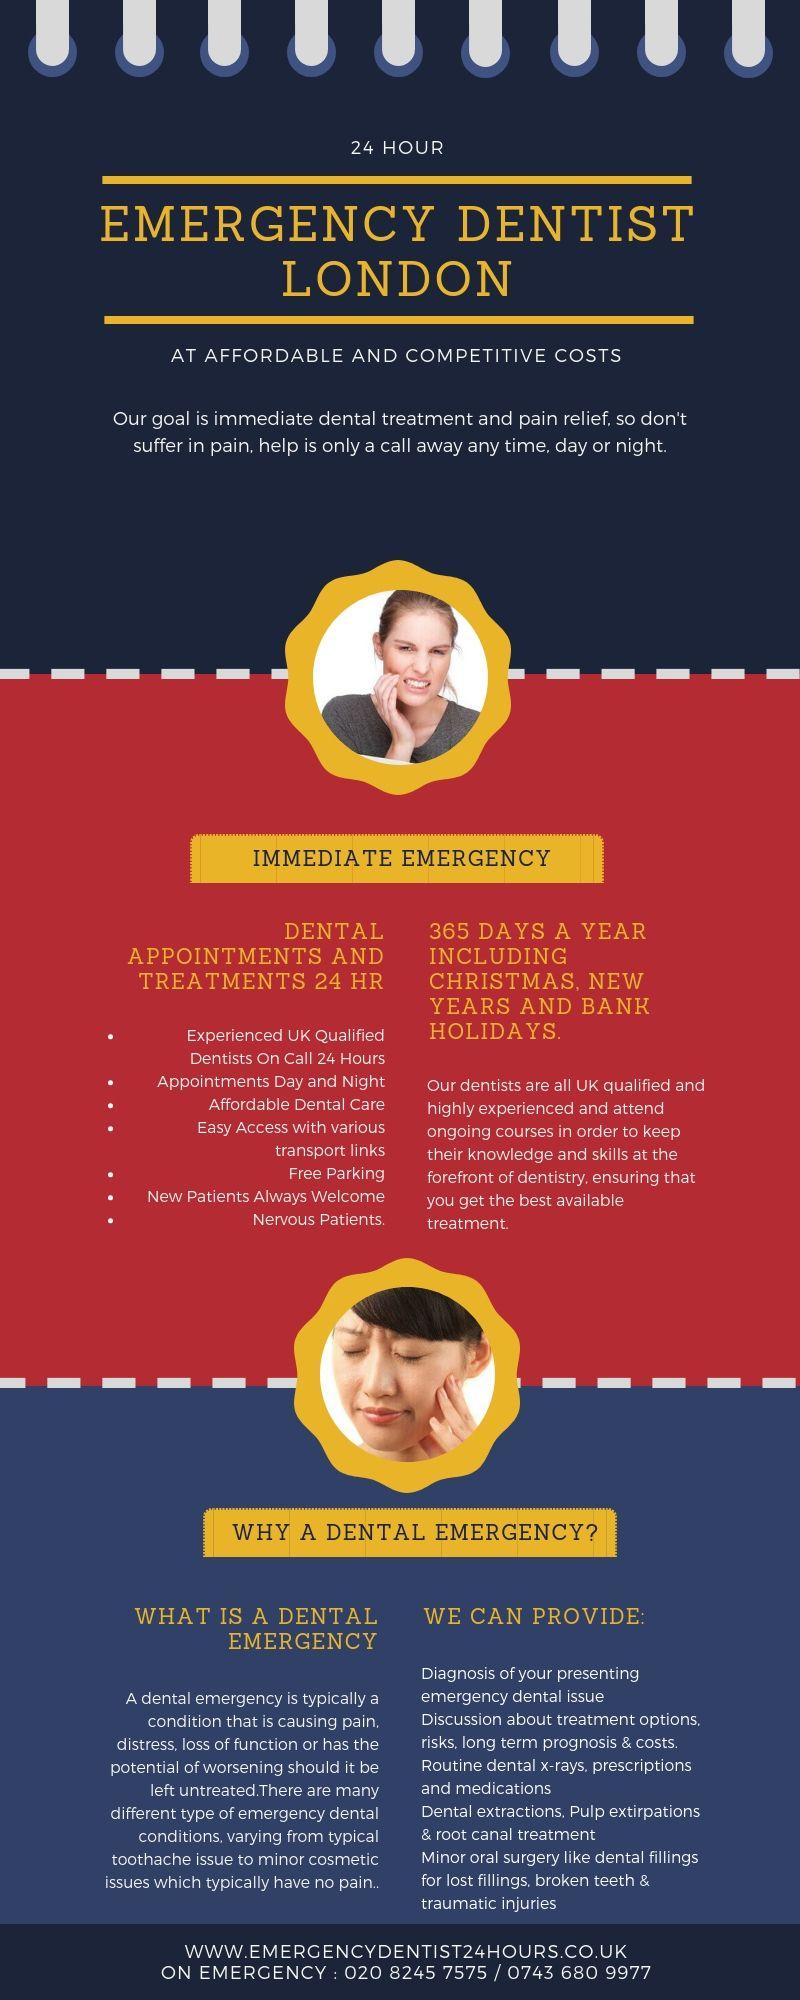 Emergency Dentist https//www.emergencydentist24hours.co